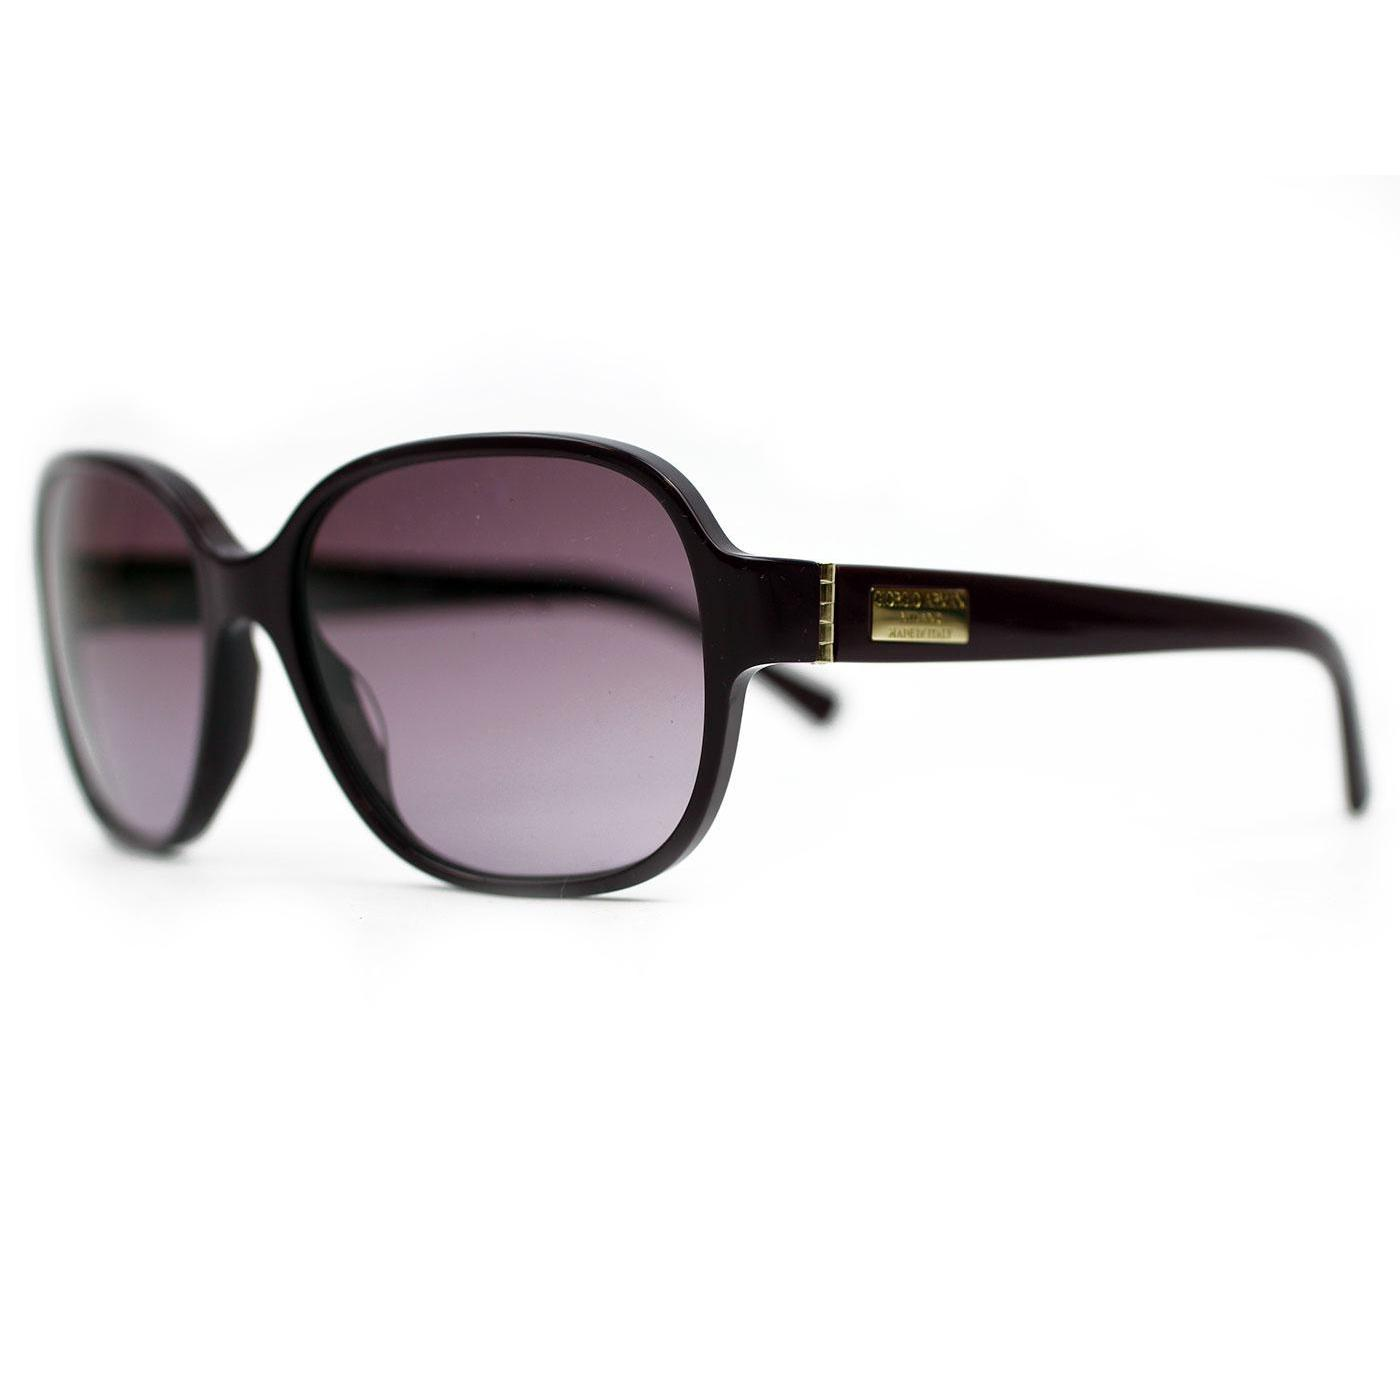 f41943d508a Giorgio Armani Wayfarer Sunglasses